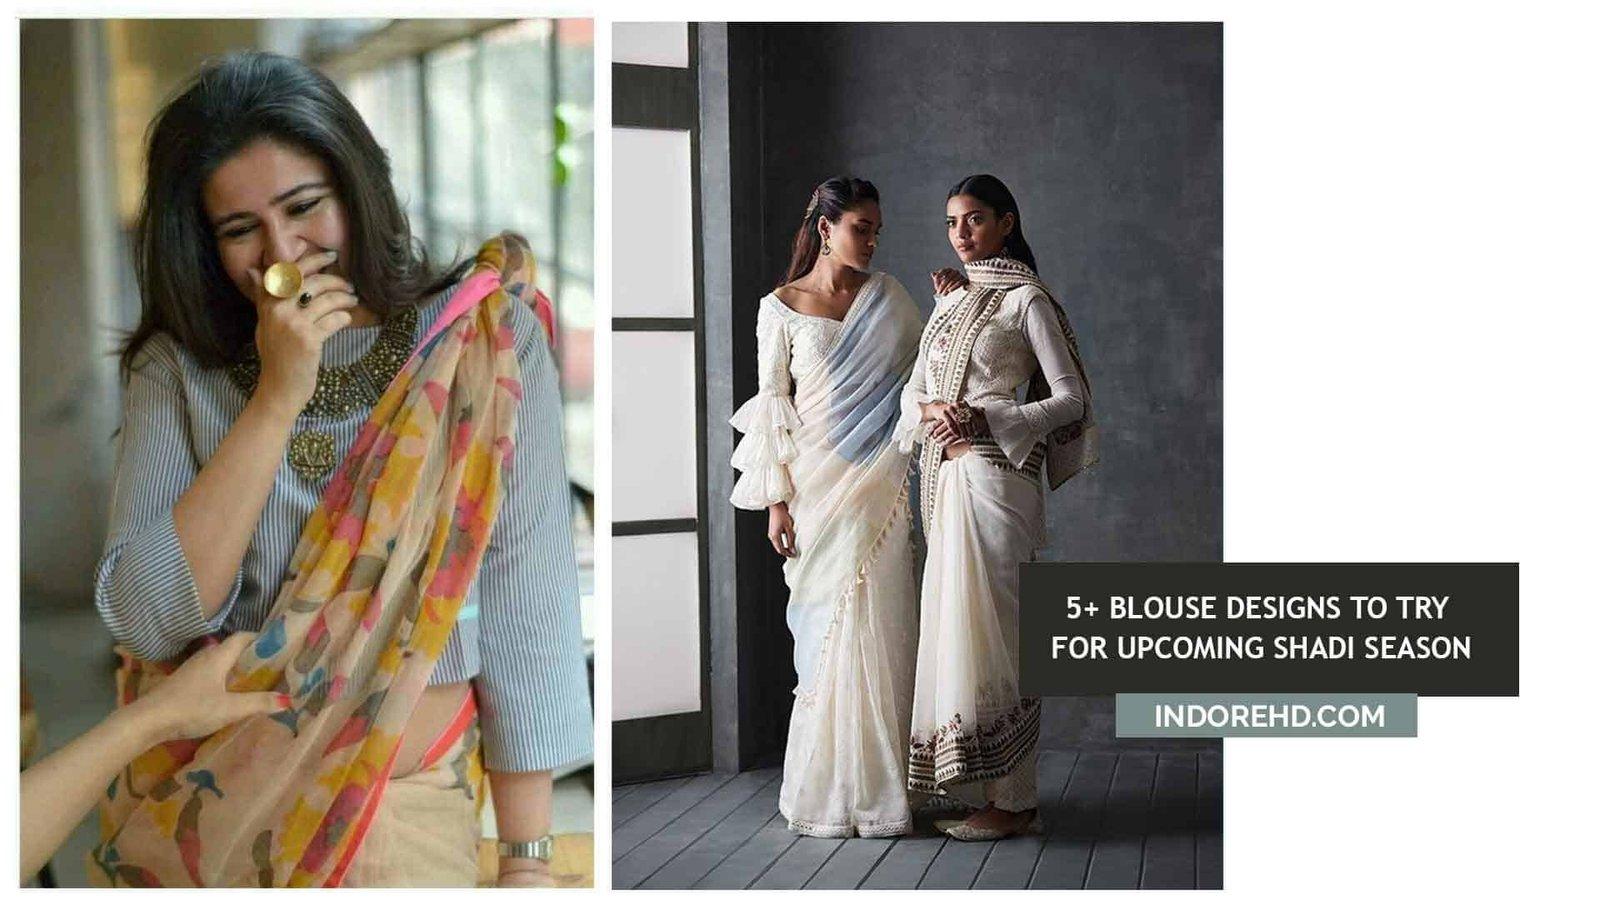 5-Plus-Blouse-Designs-shaadi-season-featured-IndoreHD